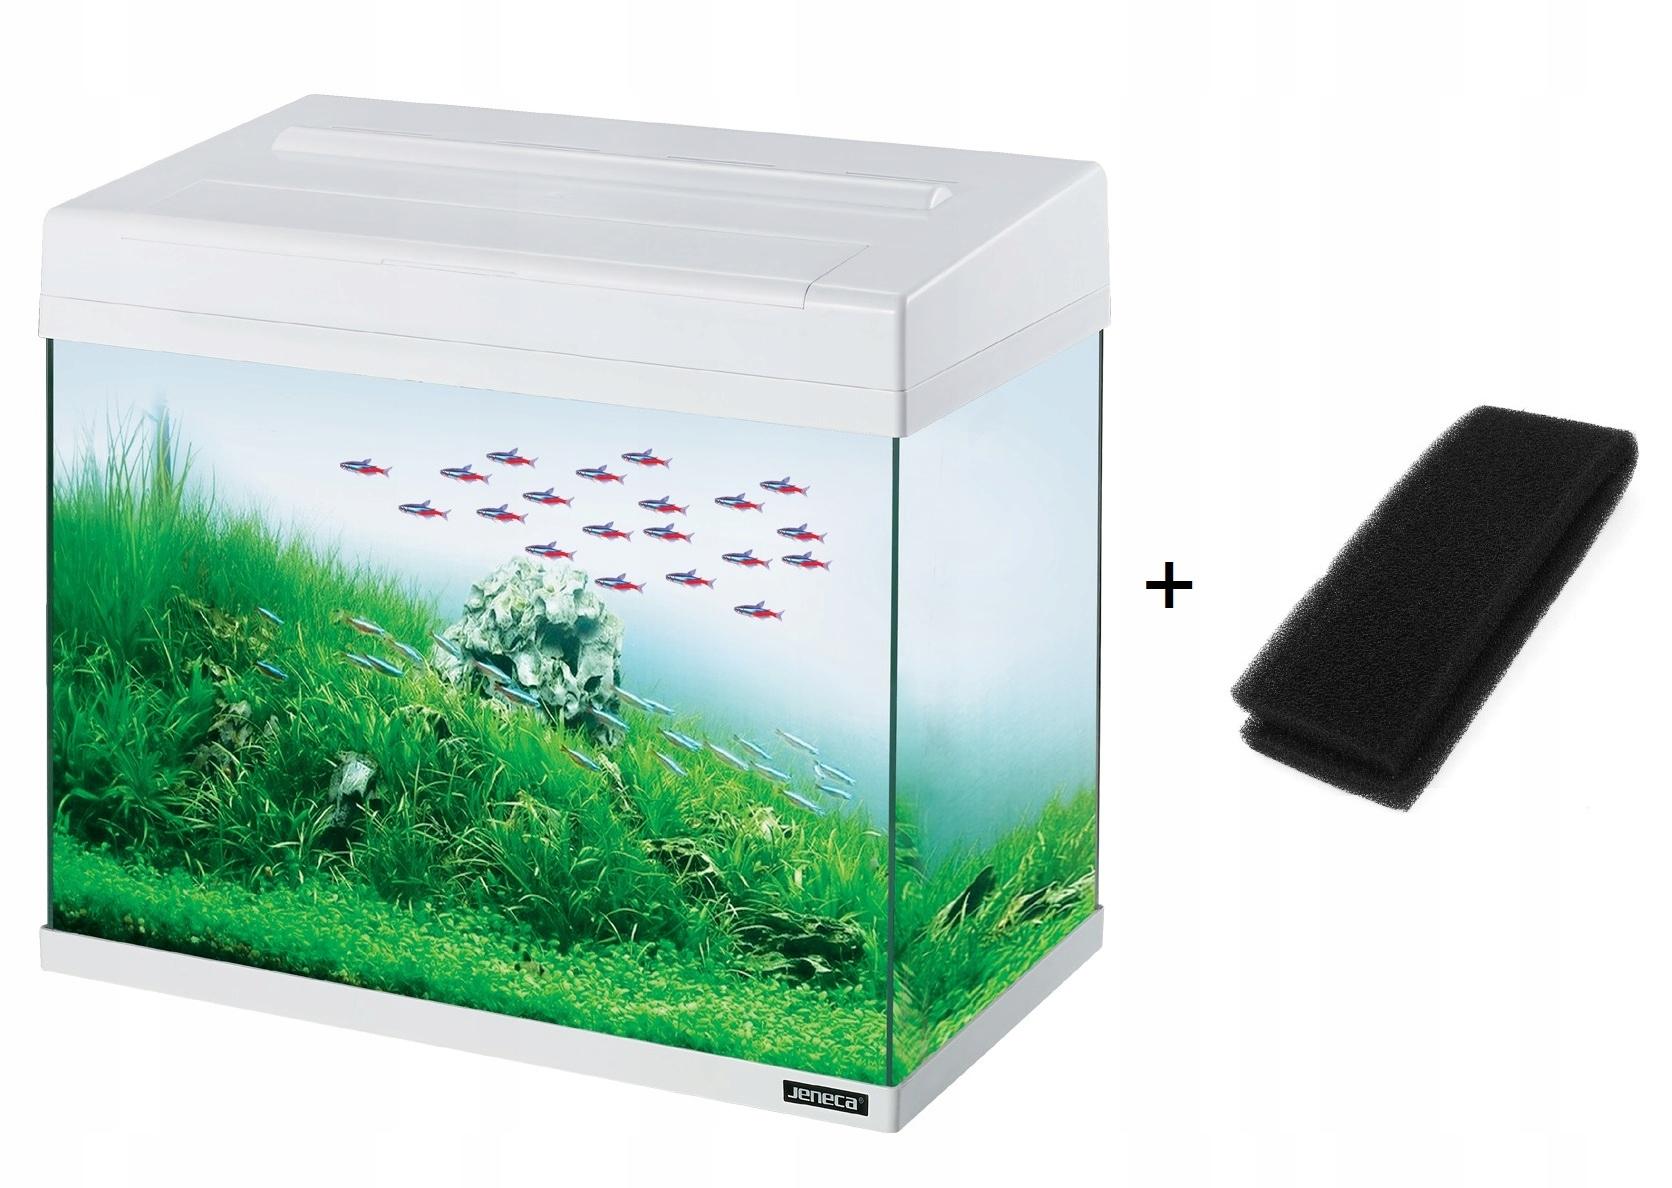 Akwarium Jeneca 24 l białe LED + Filtr w pokrywie